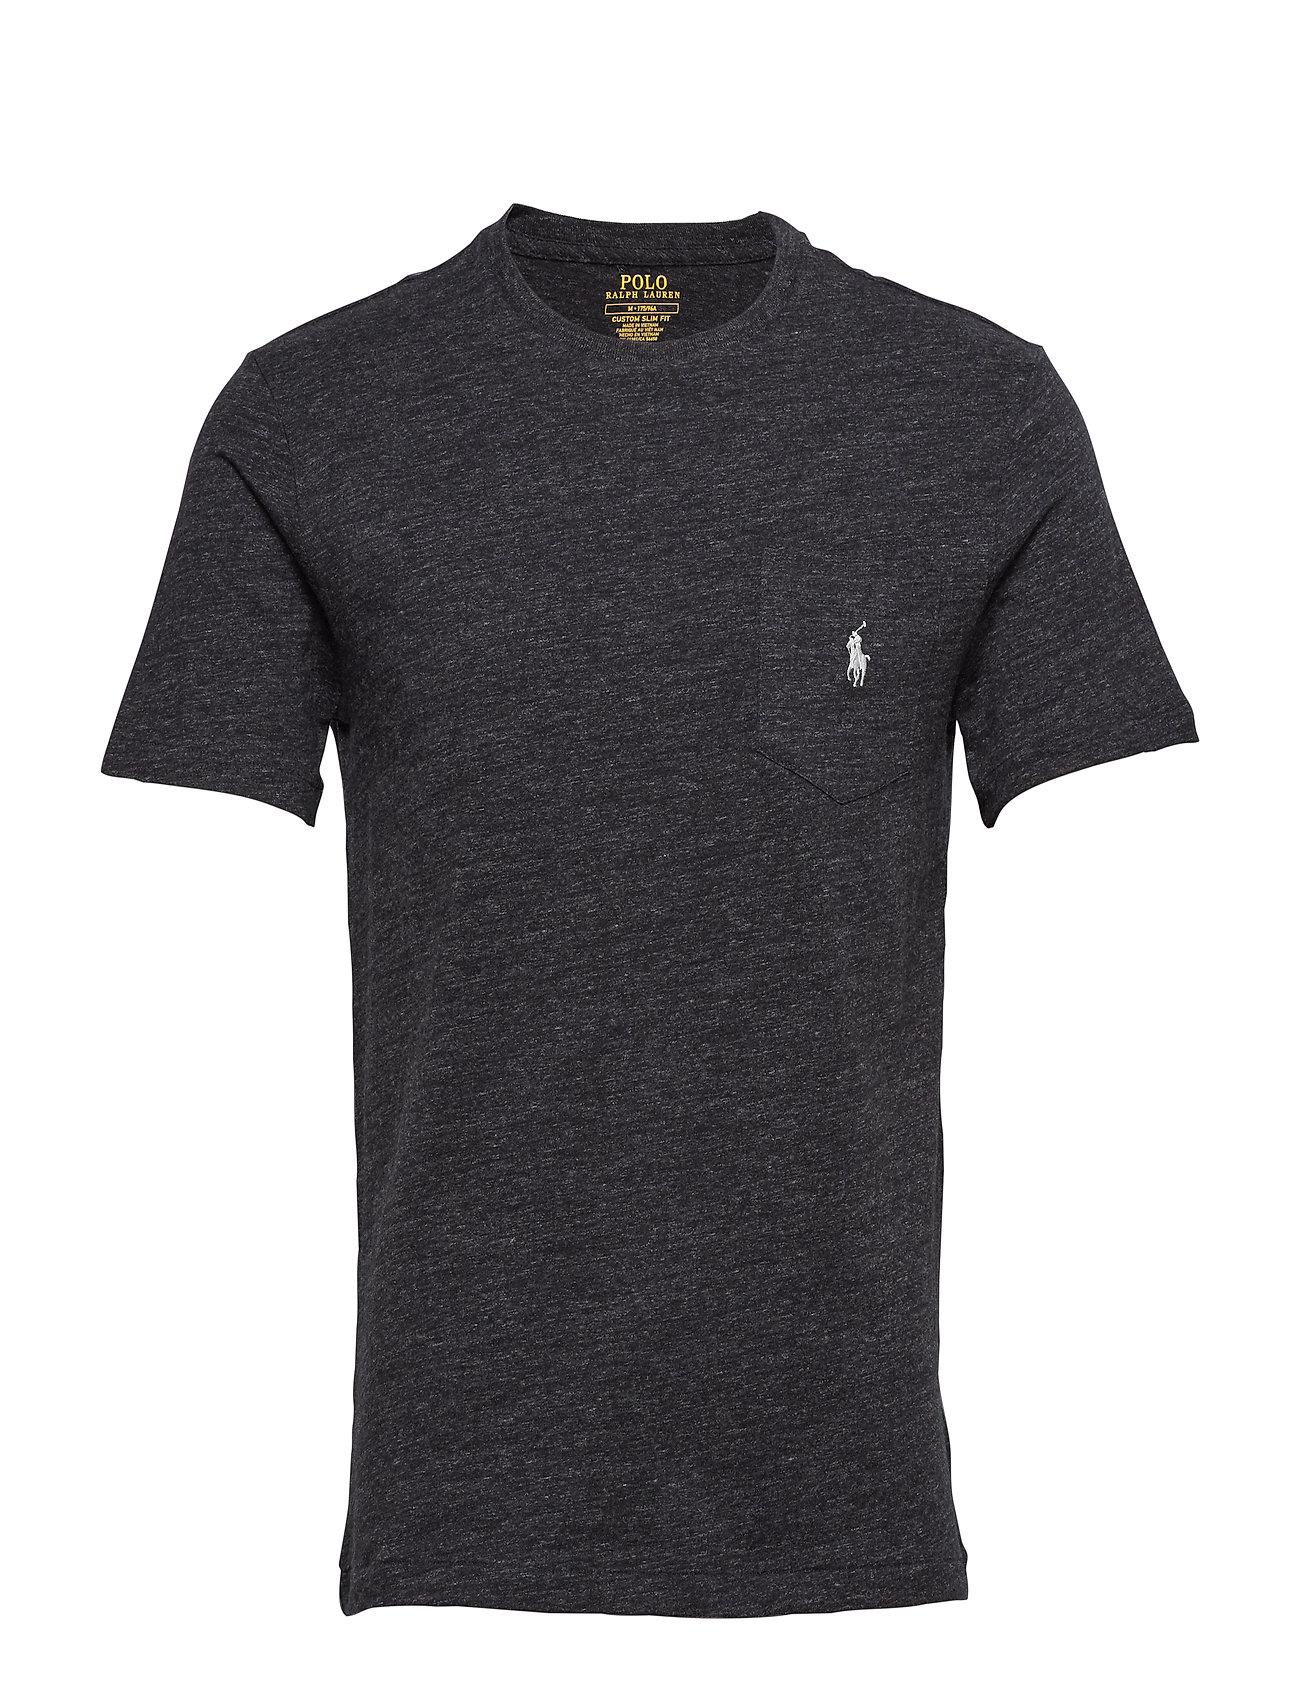 0926bfb449cabc Custom Slim Fit Pocket T-shirt (Black Marl Heathe) (£34.30) - Polo ...